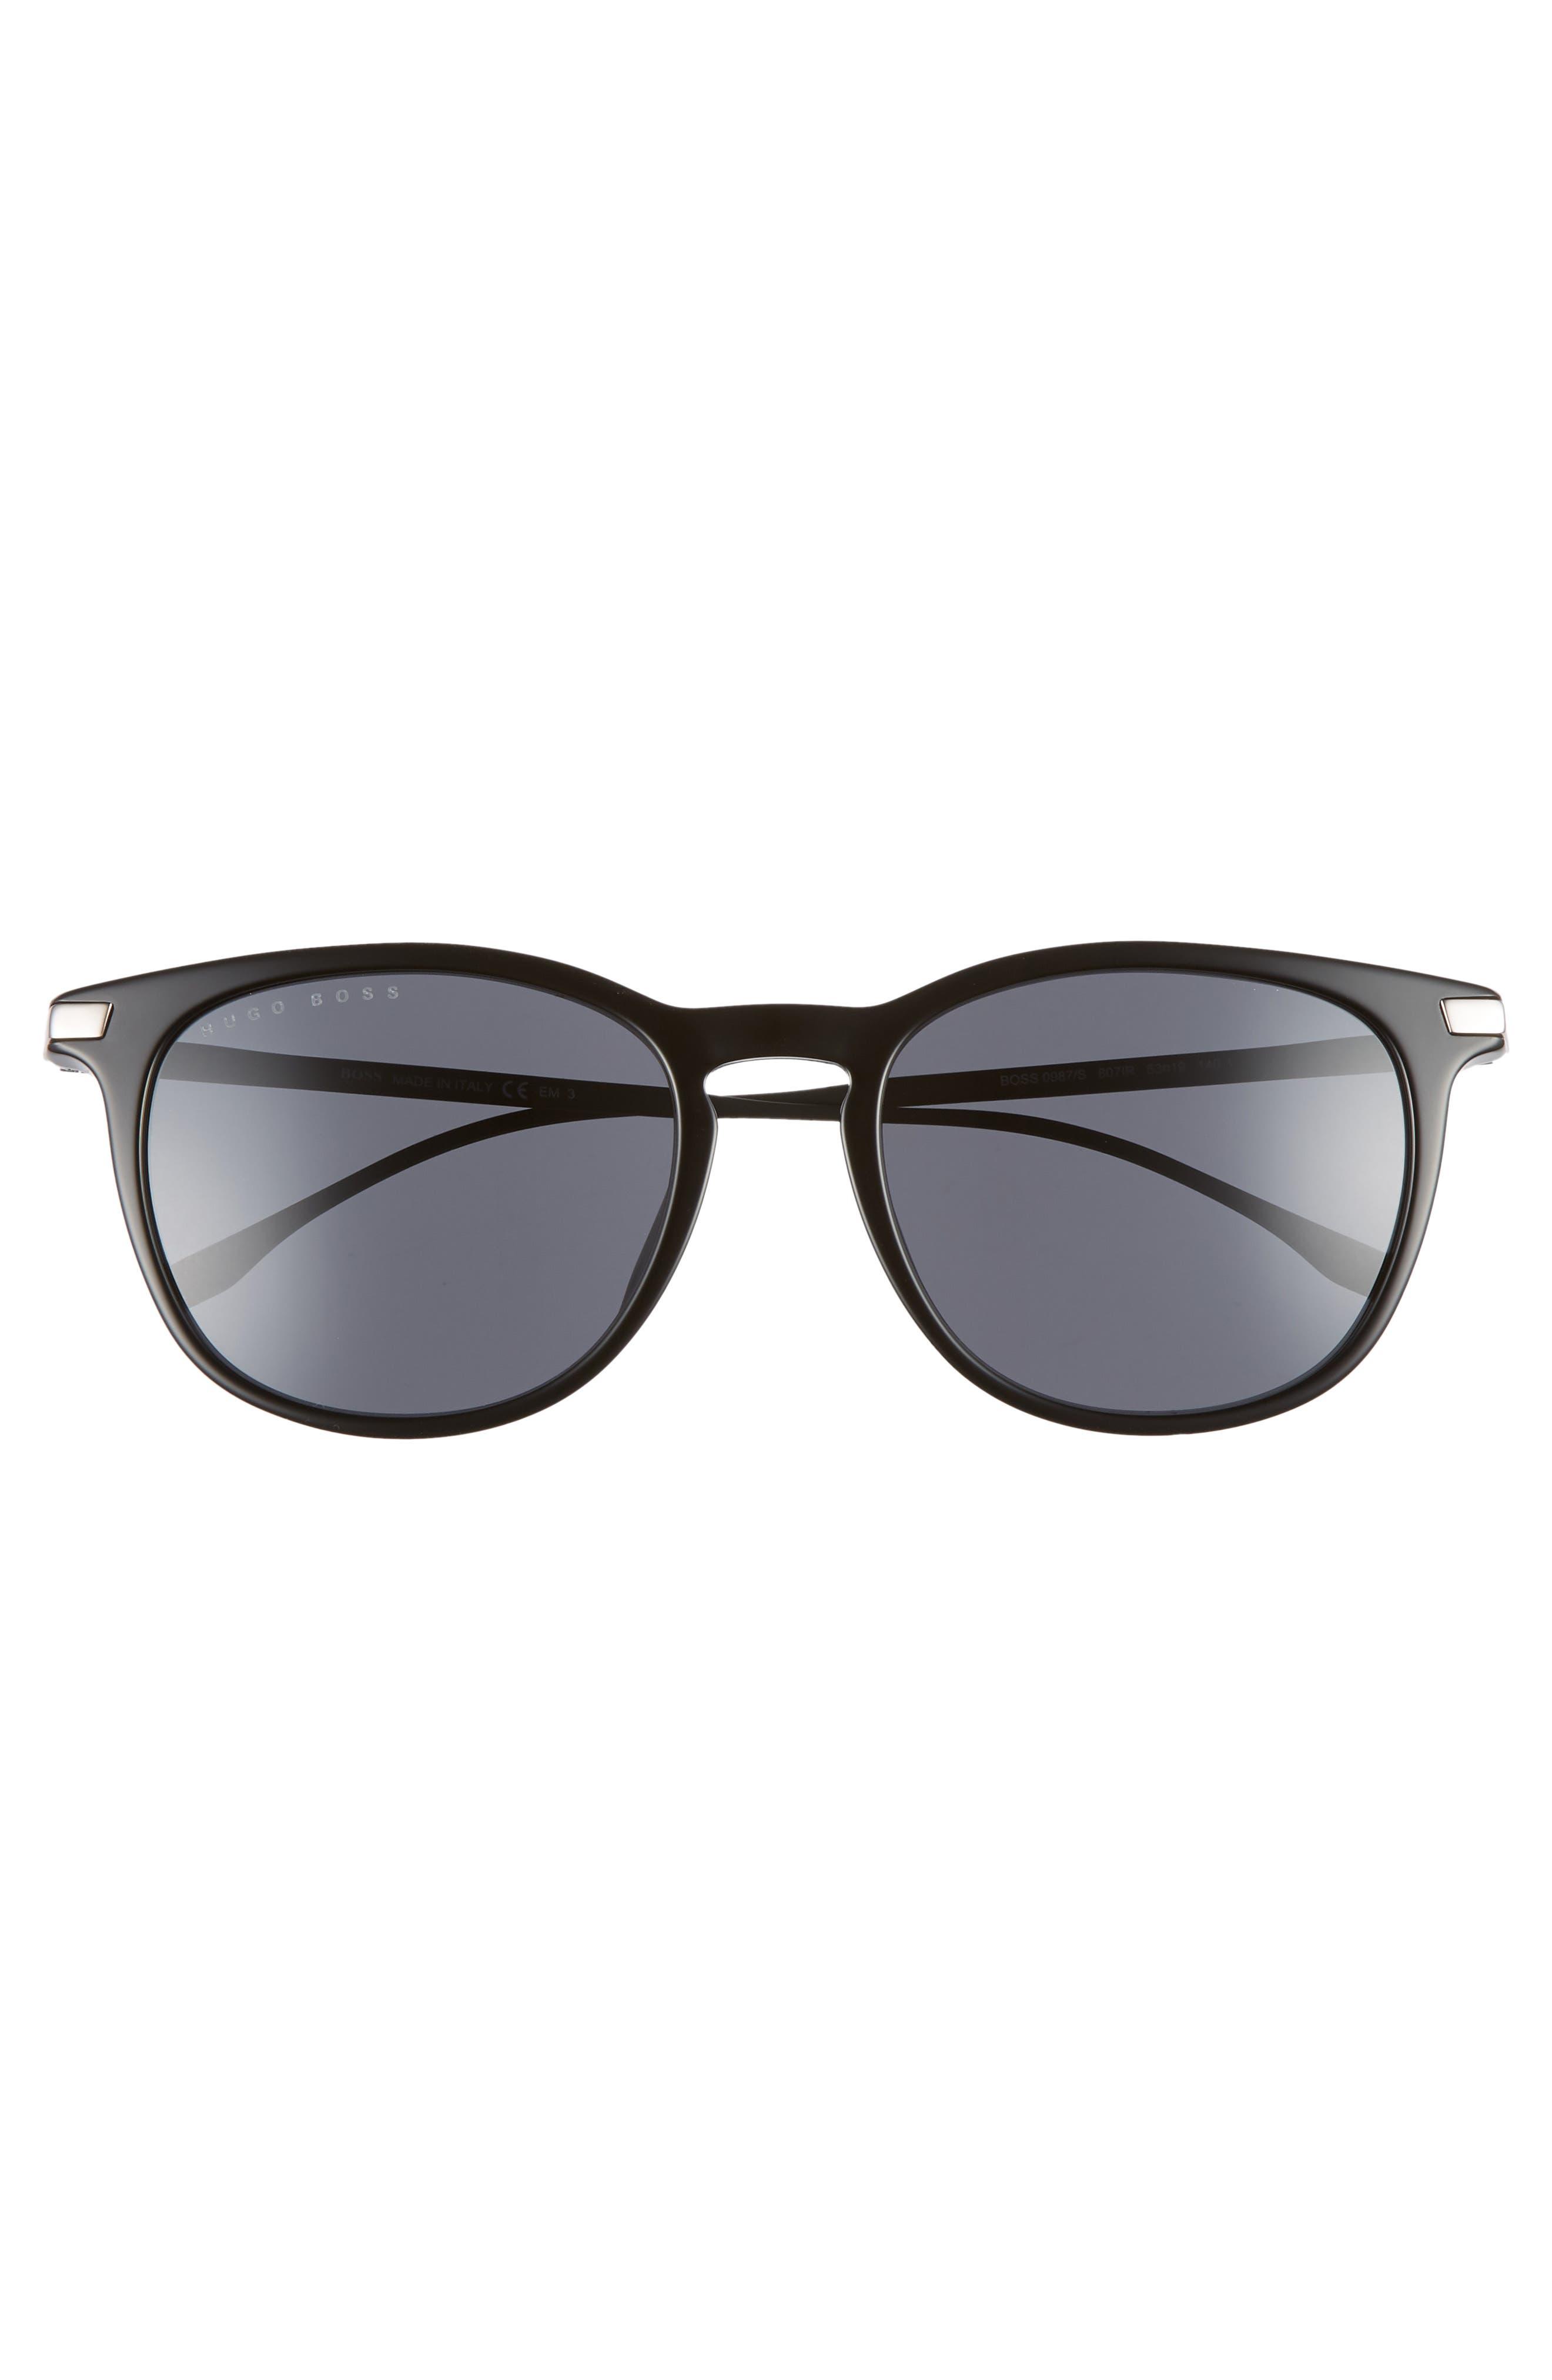 53mm Sunglasses,                             Alternate thumbnail 3, color,                             BLACK